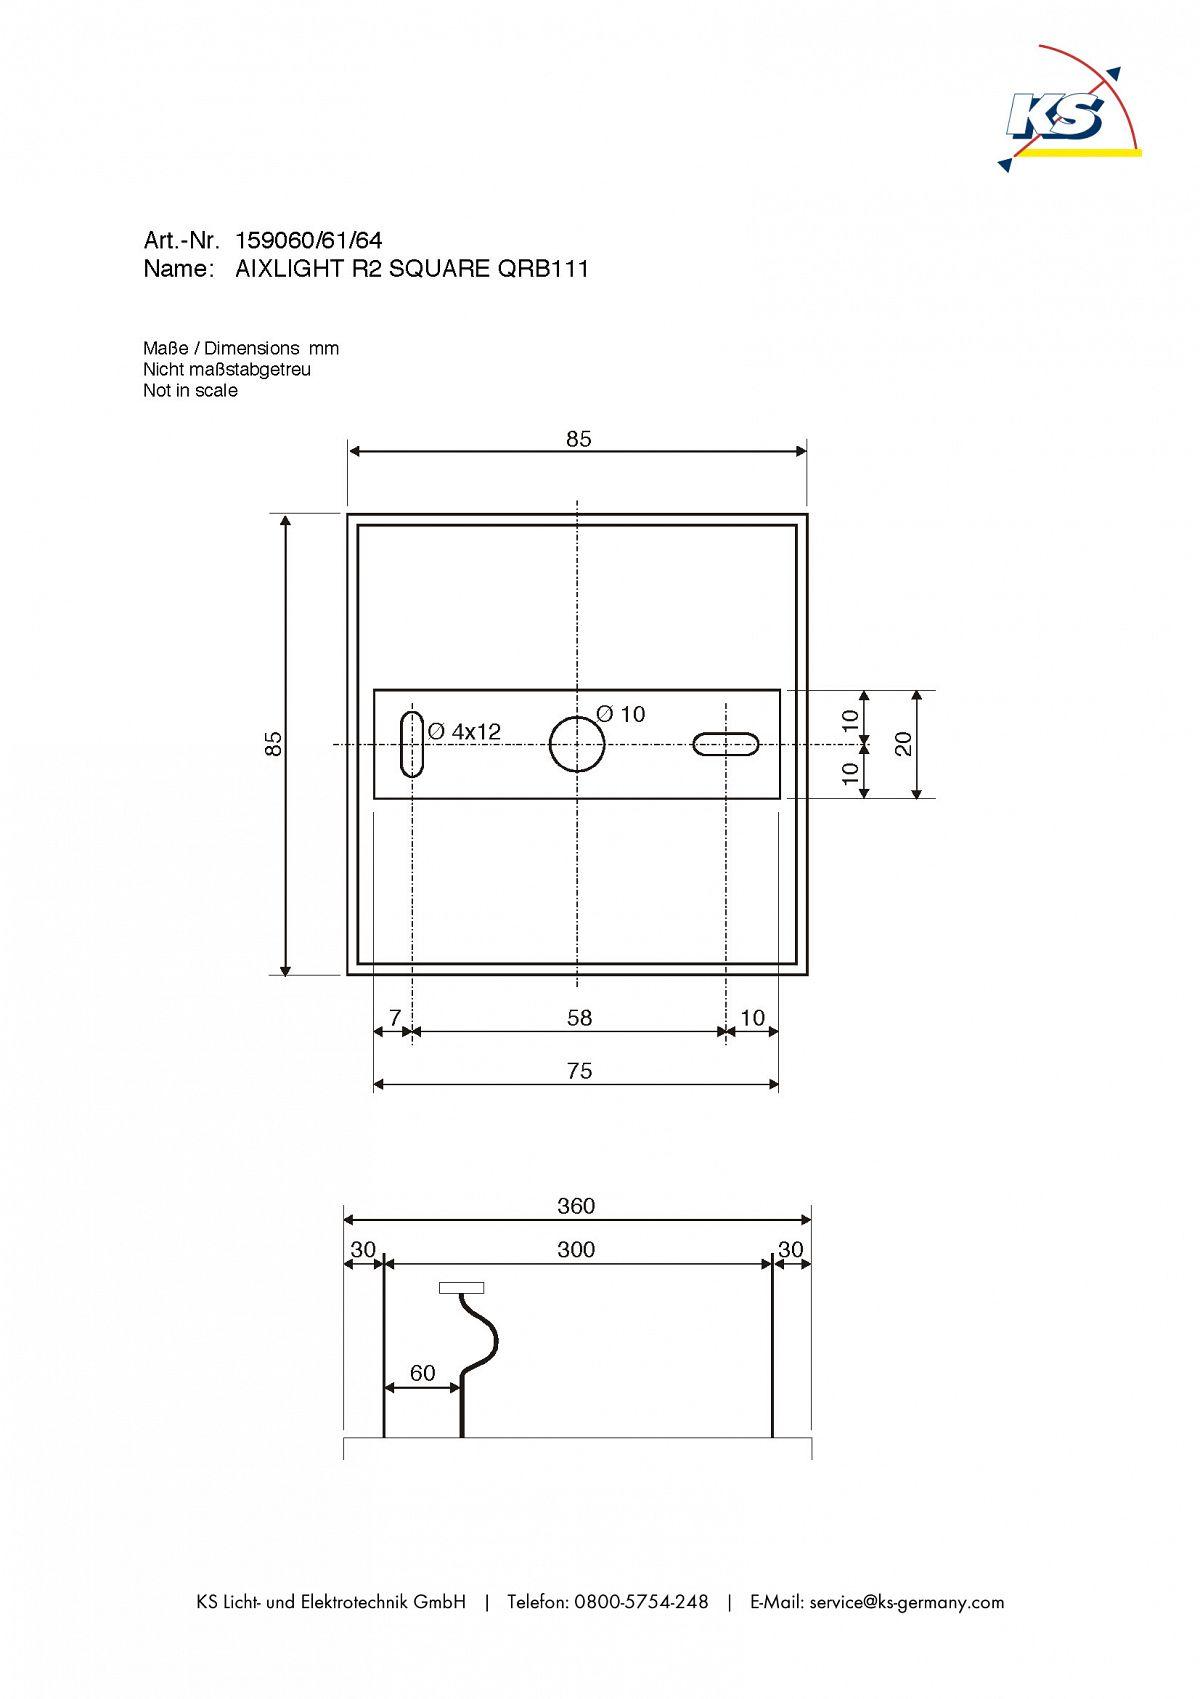 pendelleuchte aixlight r2 square qrb111 halb rund g53 max 4x50w wei ks licht onlineshop. Black Bedroom Furniture Sets. Home Design Ideas